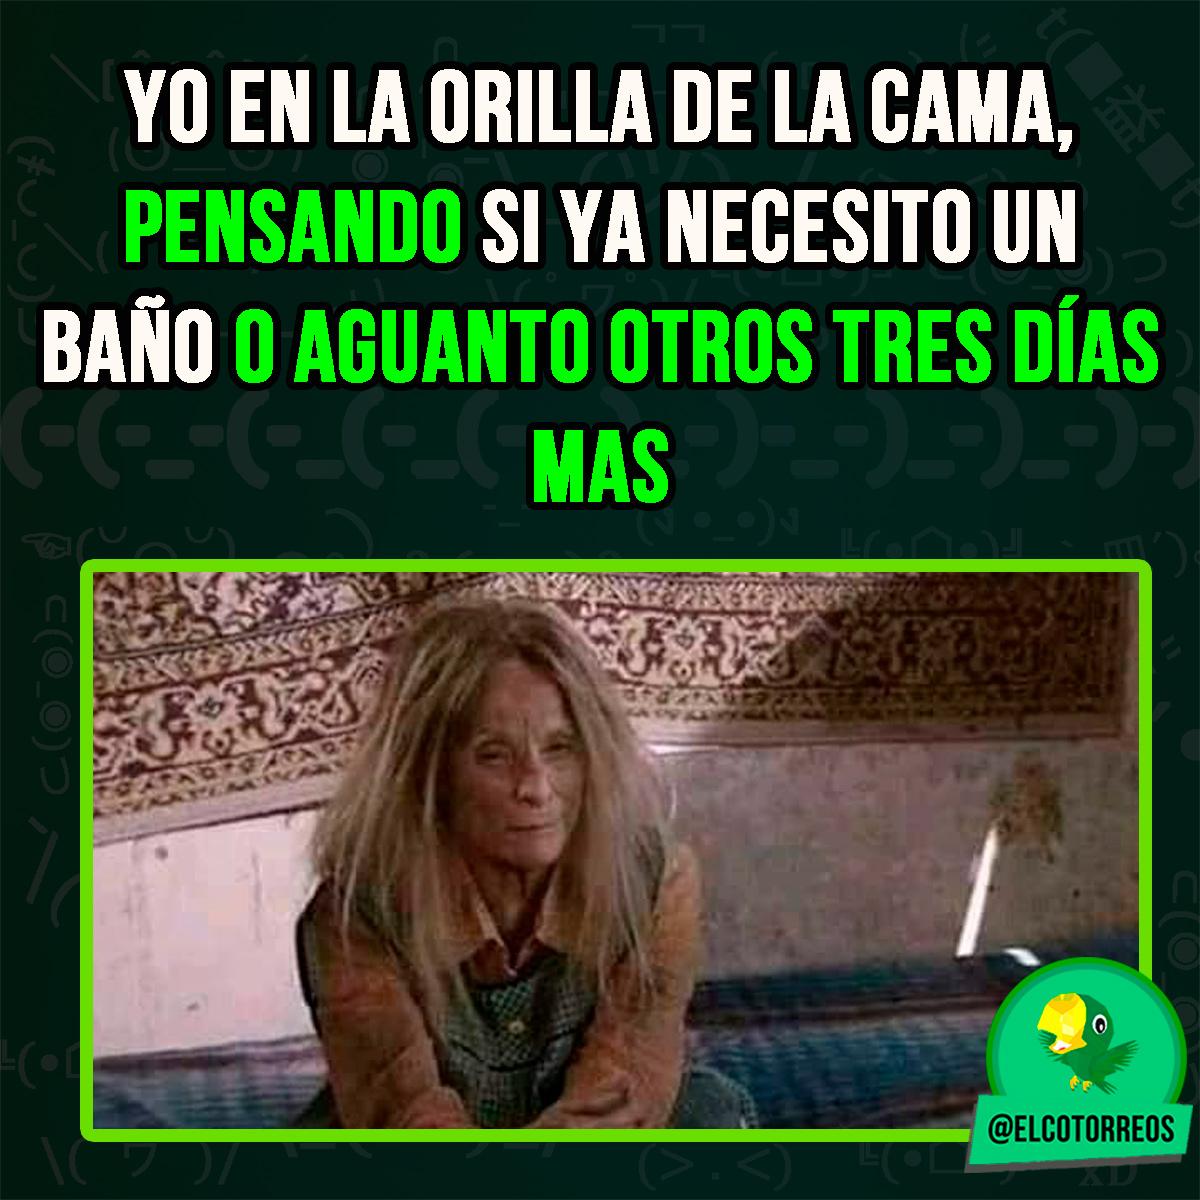 Es que con estos fríos esta cabrón!   Sígueme  para mucho mas: @elcotorreos  #memesespañol #momazos #momazo #memazos #momo #momos #memes #meme #humor #sdlg #momossad #momos_4k #repoio #cmamo #cmamut #chistes #gracioso #funnymemes #memes#lmao #memesdailypic.twitter.com/c4ssw7t9z5